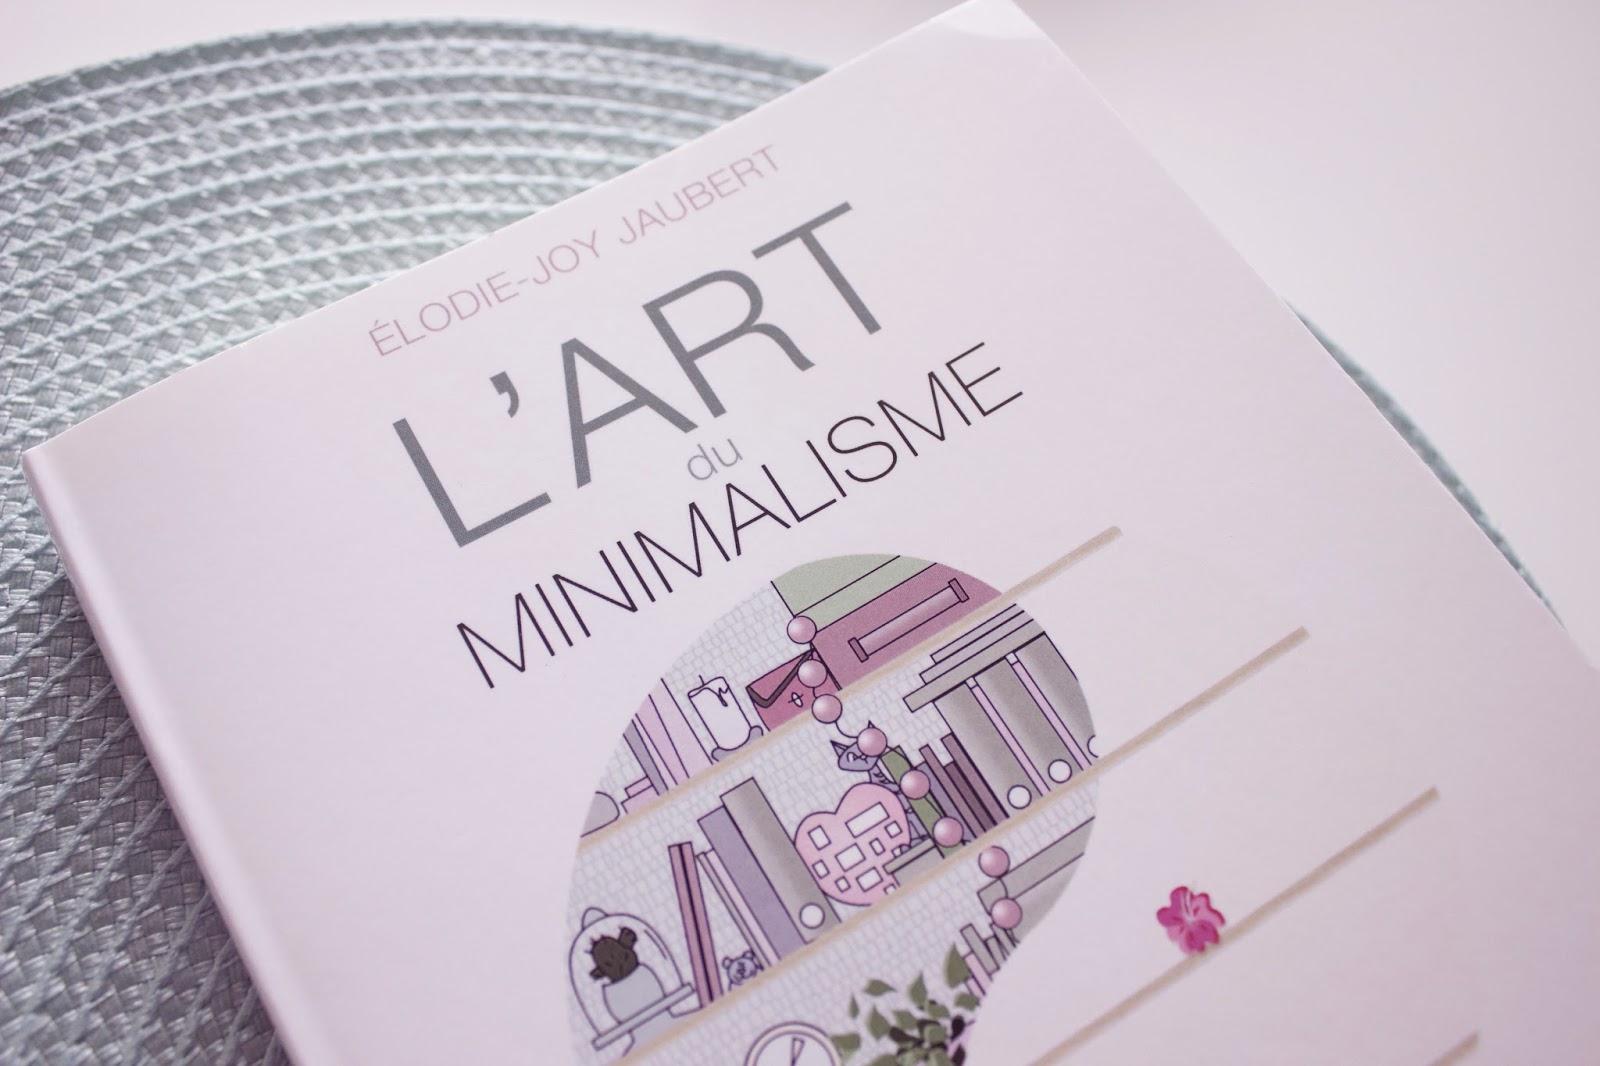 L 39 art du minimalisme aurelieleee for Minimalisme art